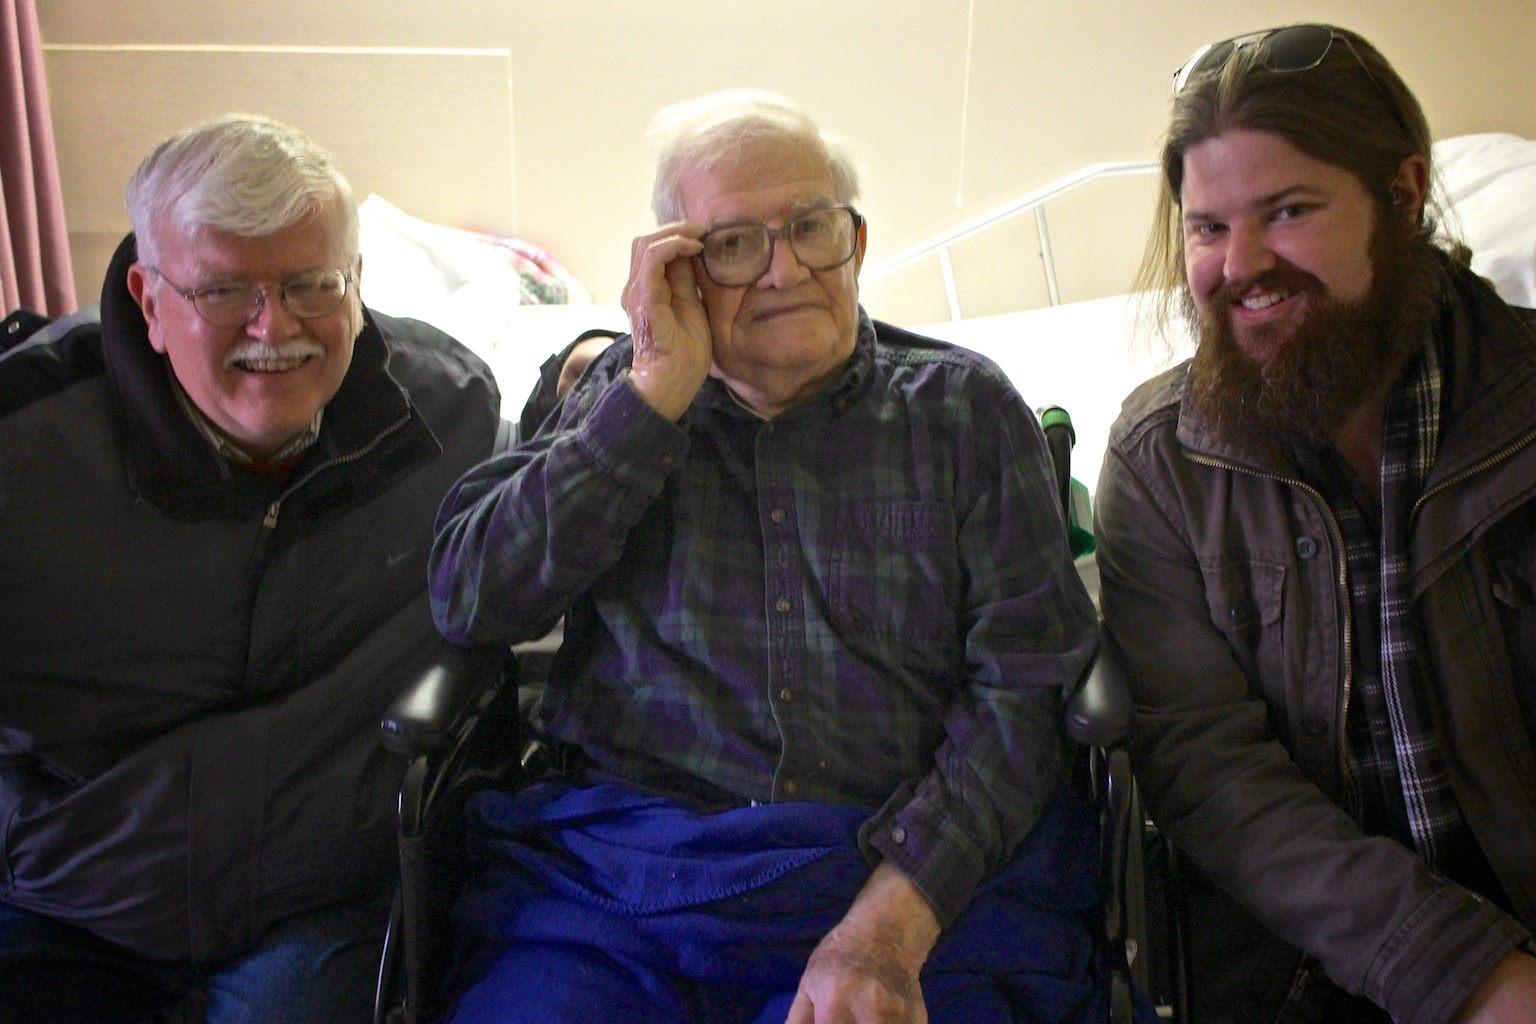 3 generations of slabaughs